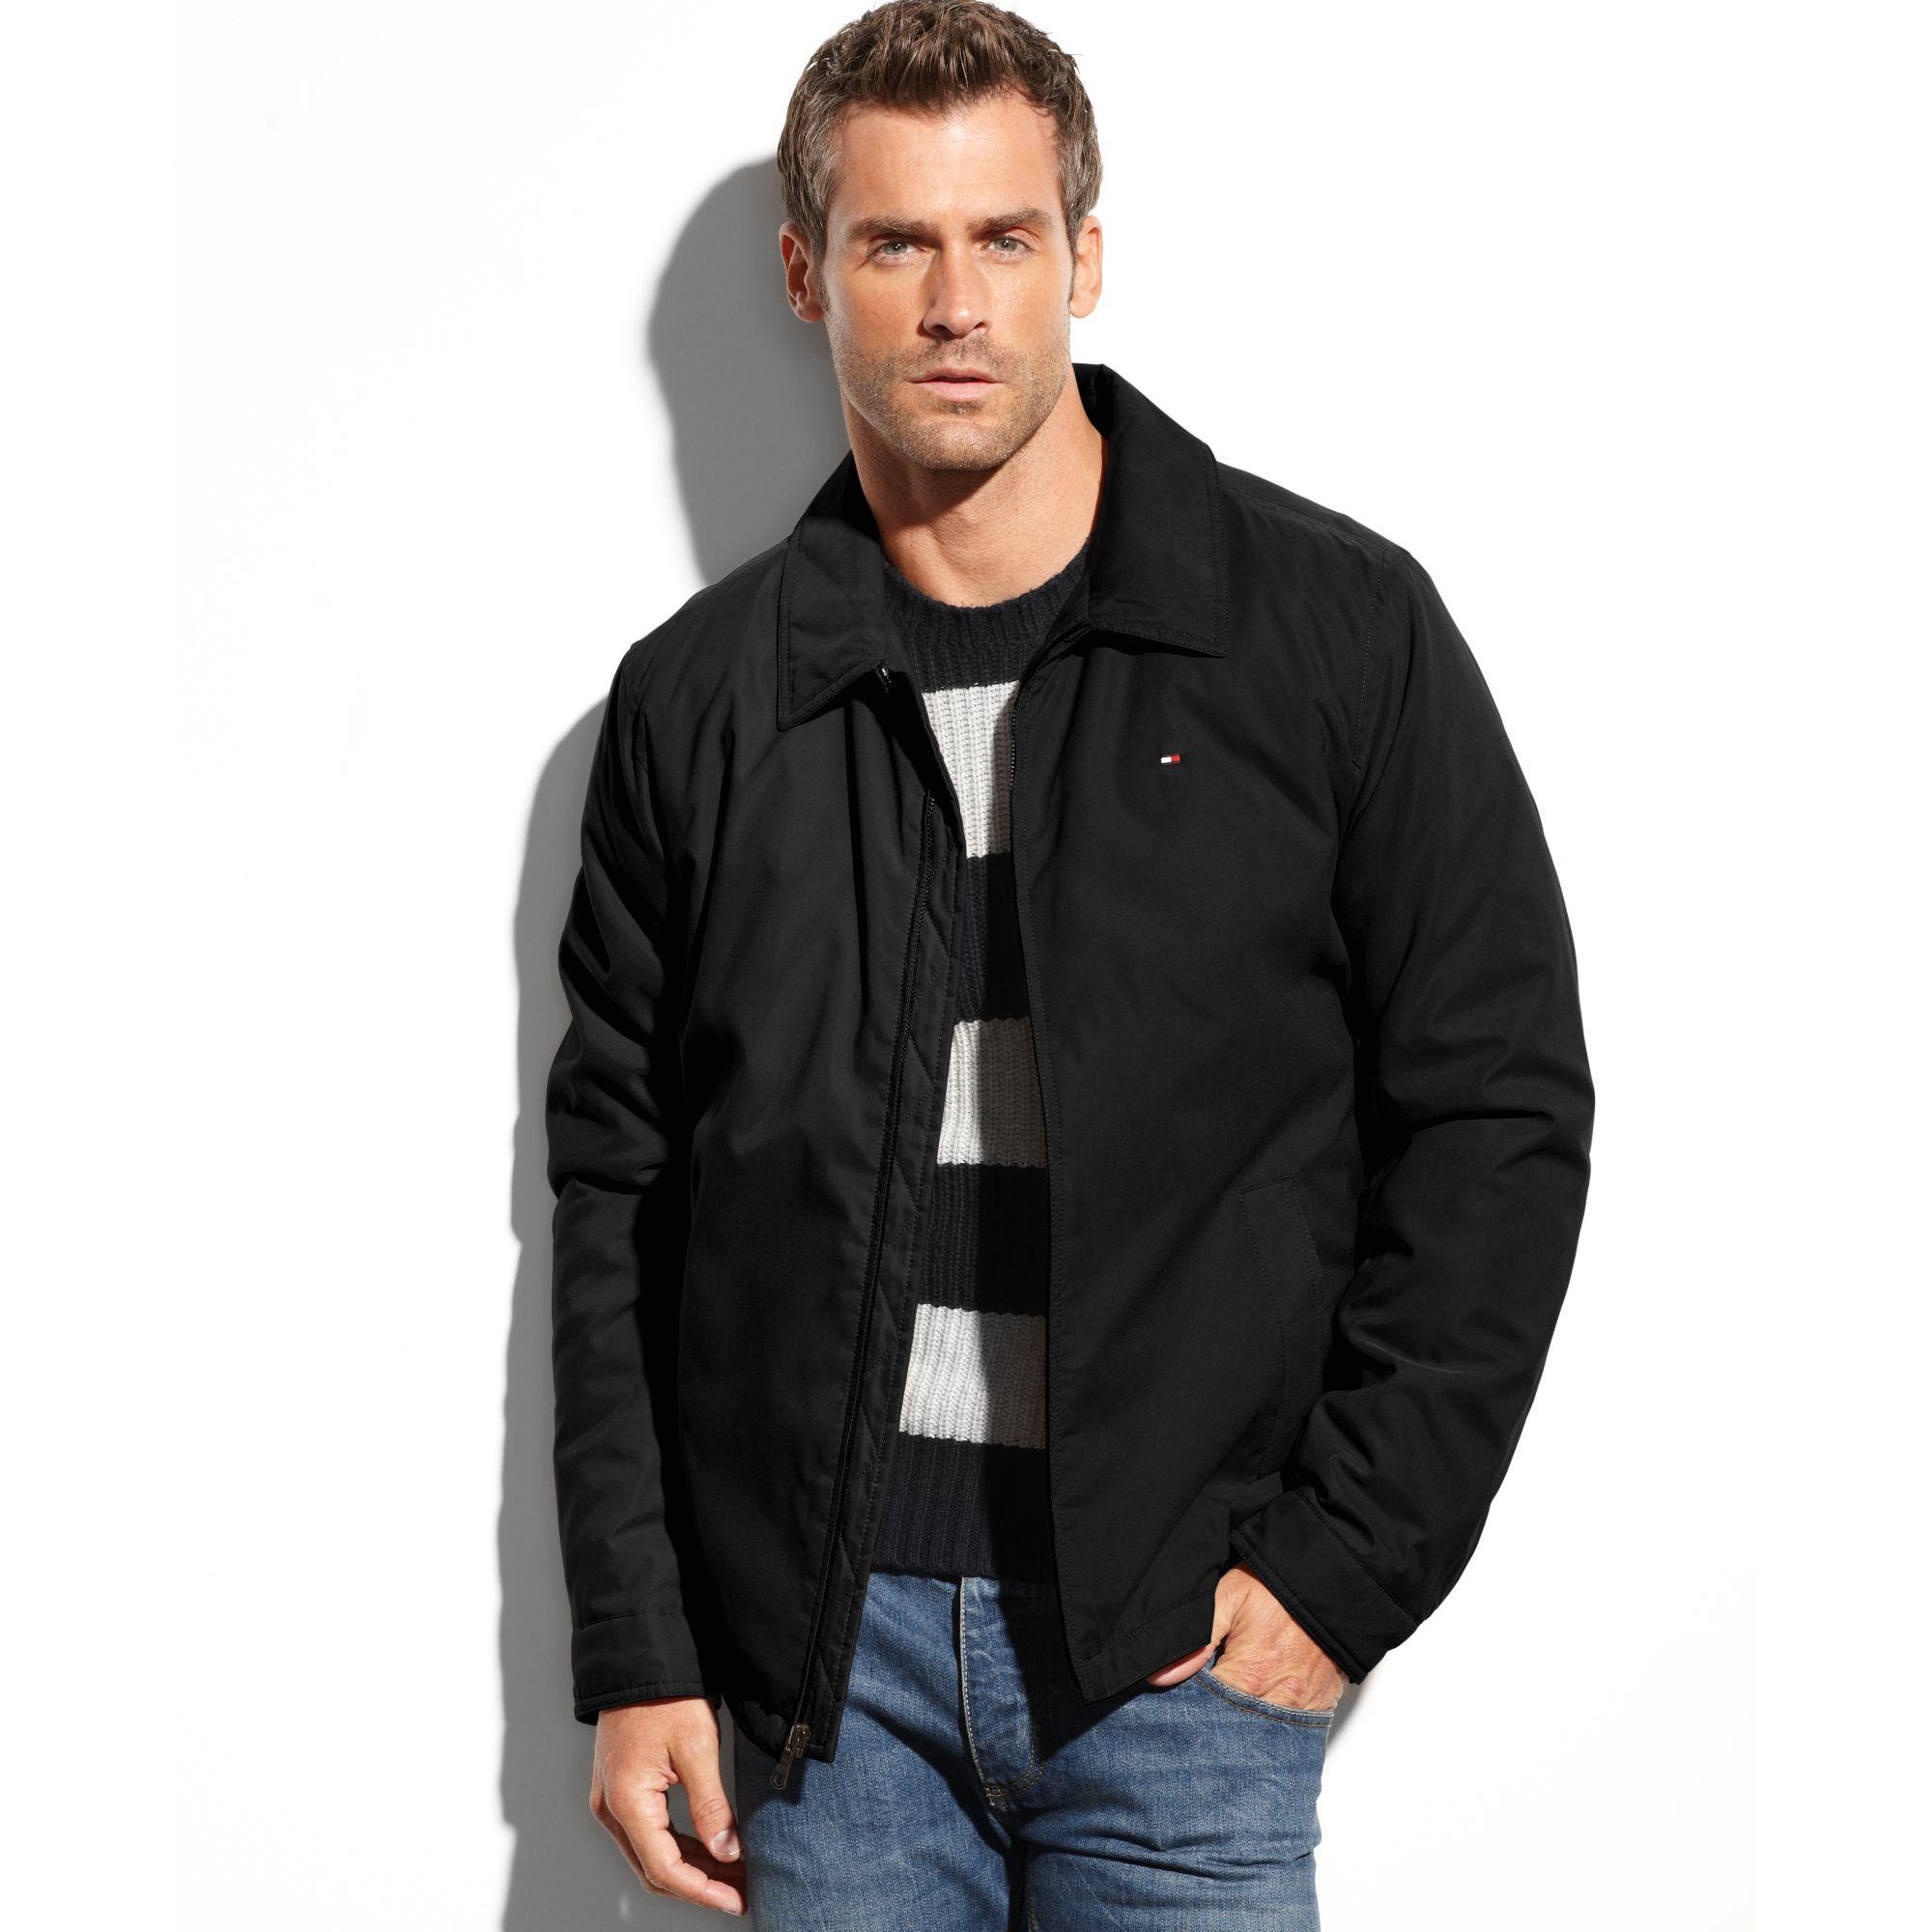 63643576af7 Lyst - Tommy Hilfiger Zip-front Micro-twill Jacket in Black for Men